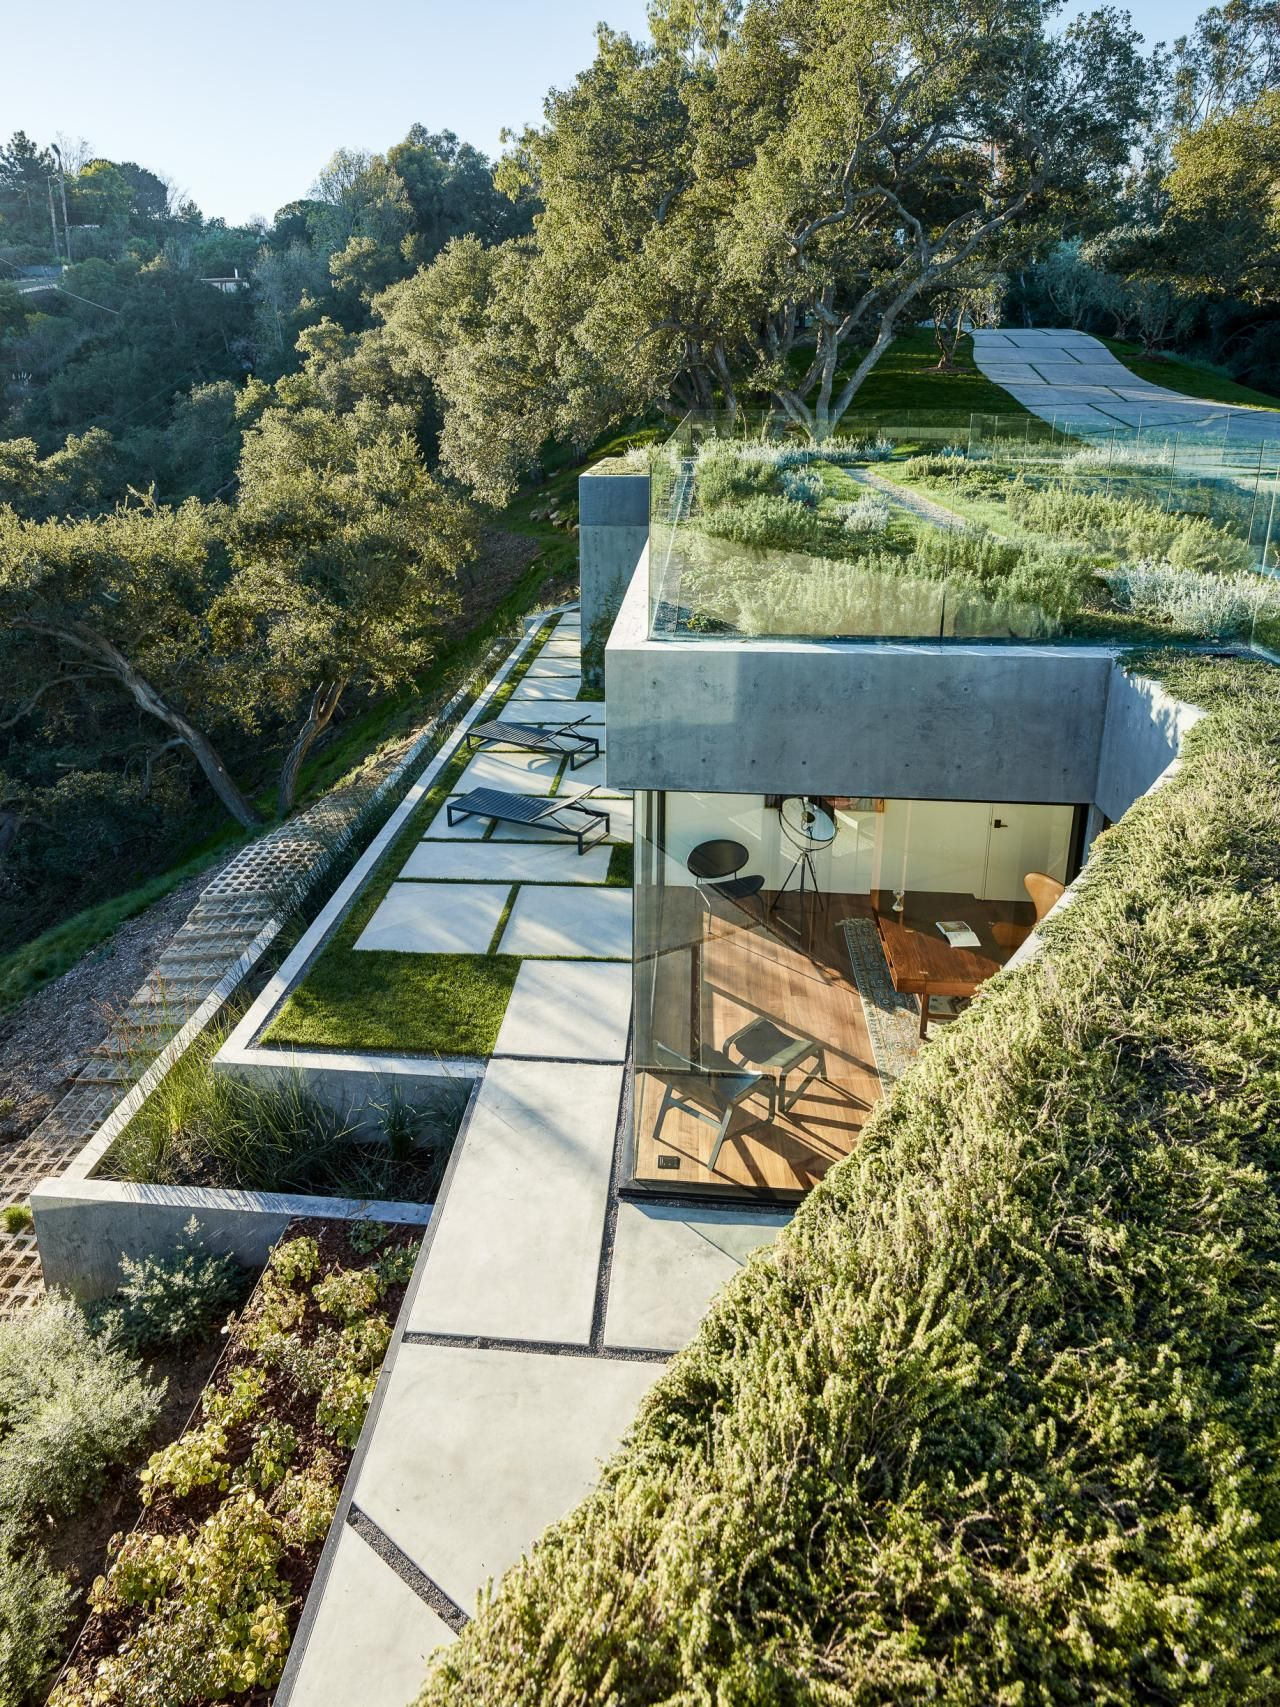 Best Kitchen Gallery: Modern Home Built Into A Hillside With Oak Trees Pinterest Fresh of Modern Home Base Of Steep Hillside on rachelxblog.com